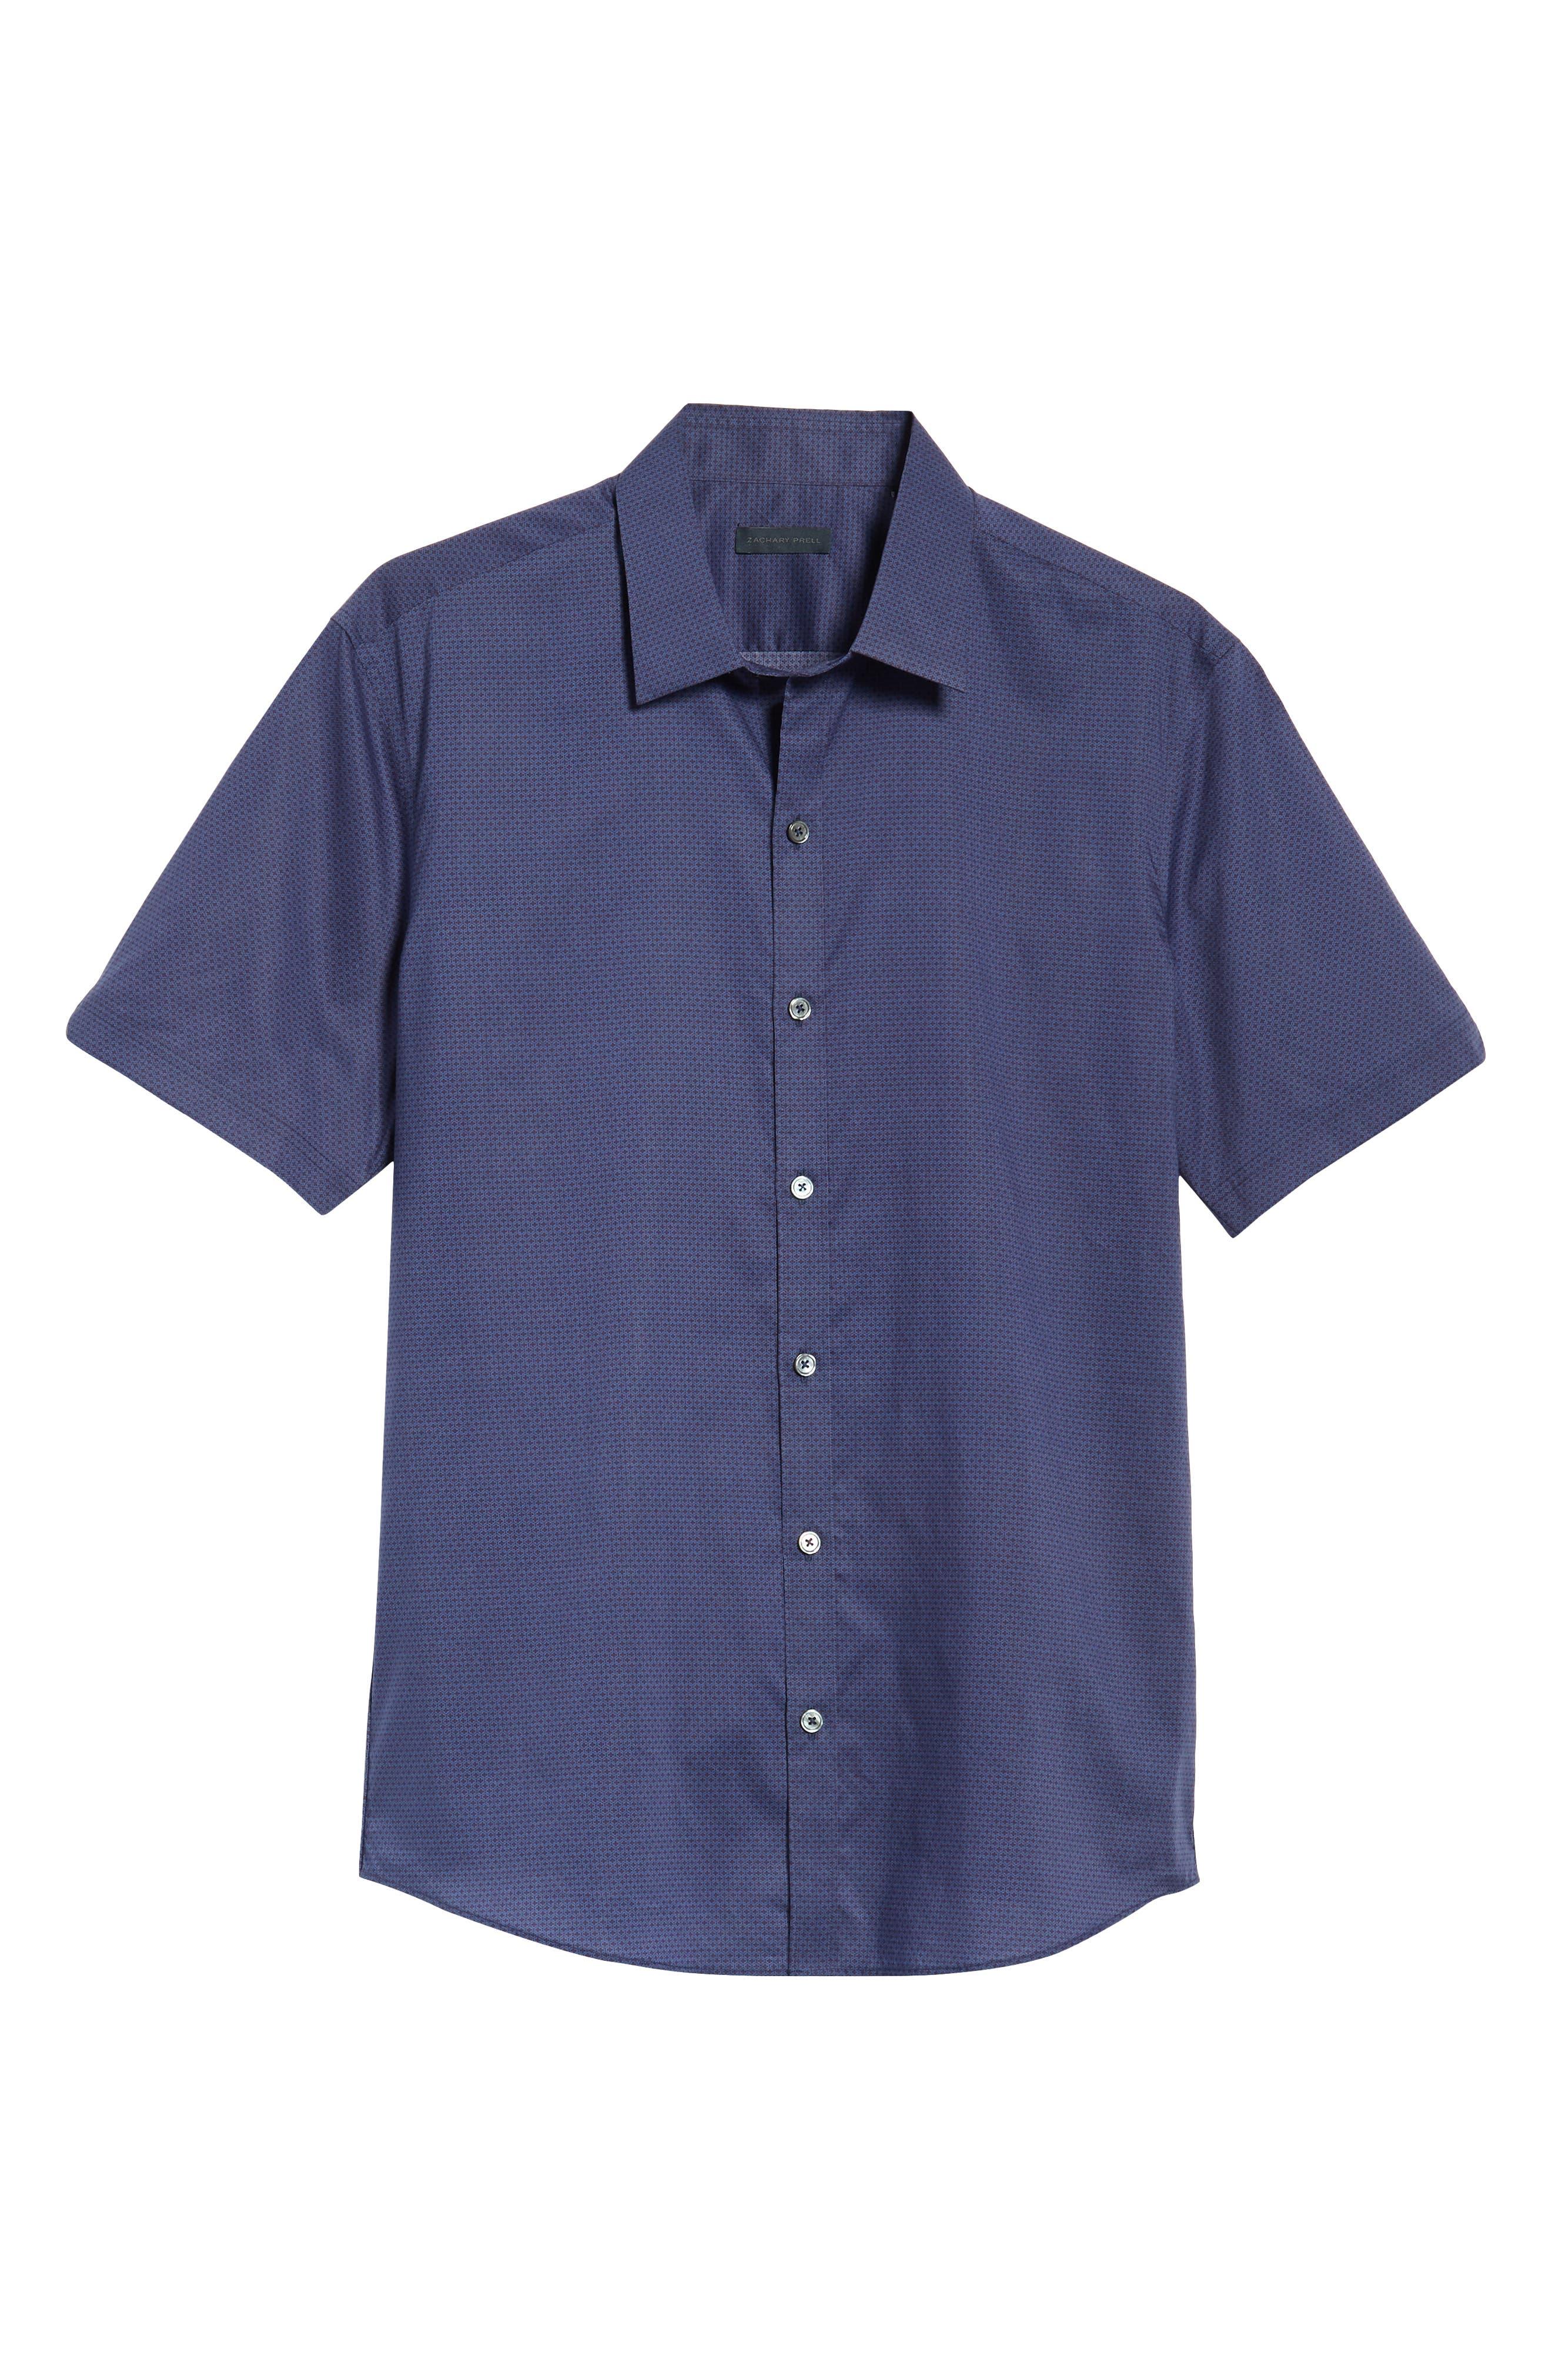 Avellan Regular Fit Sport Shirt,                             Alternate thumbnail 6, color,                             BLUE